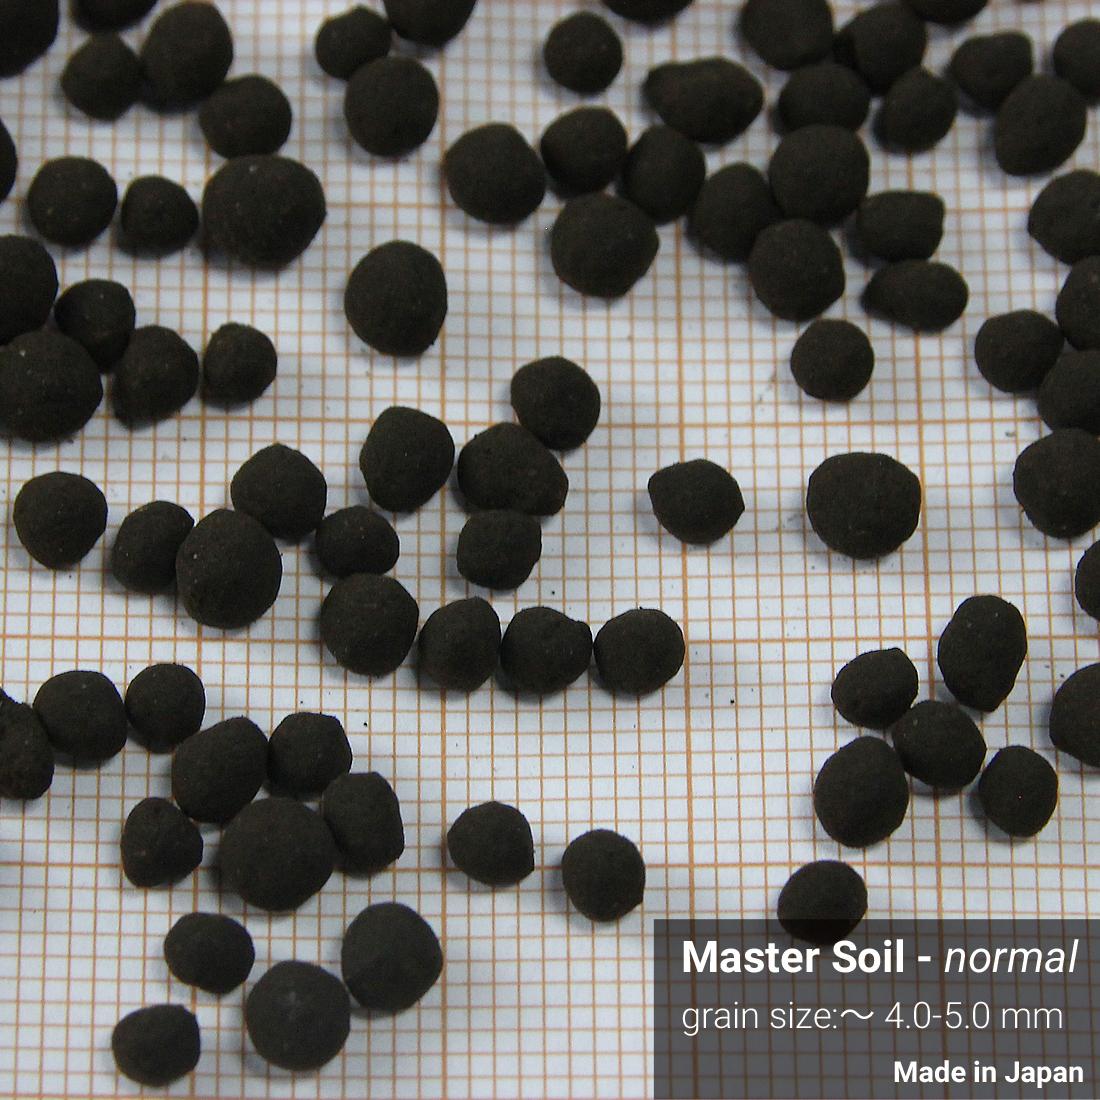 Master Soil - normal